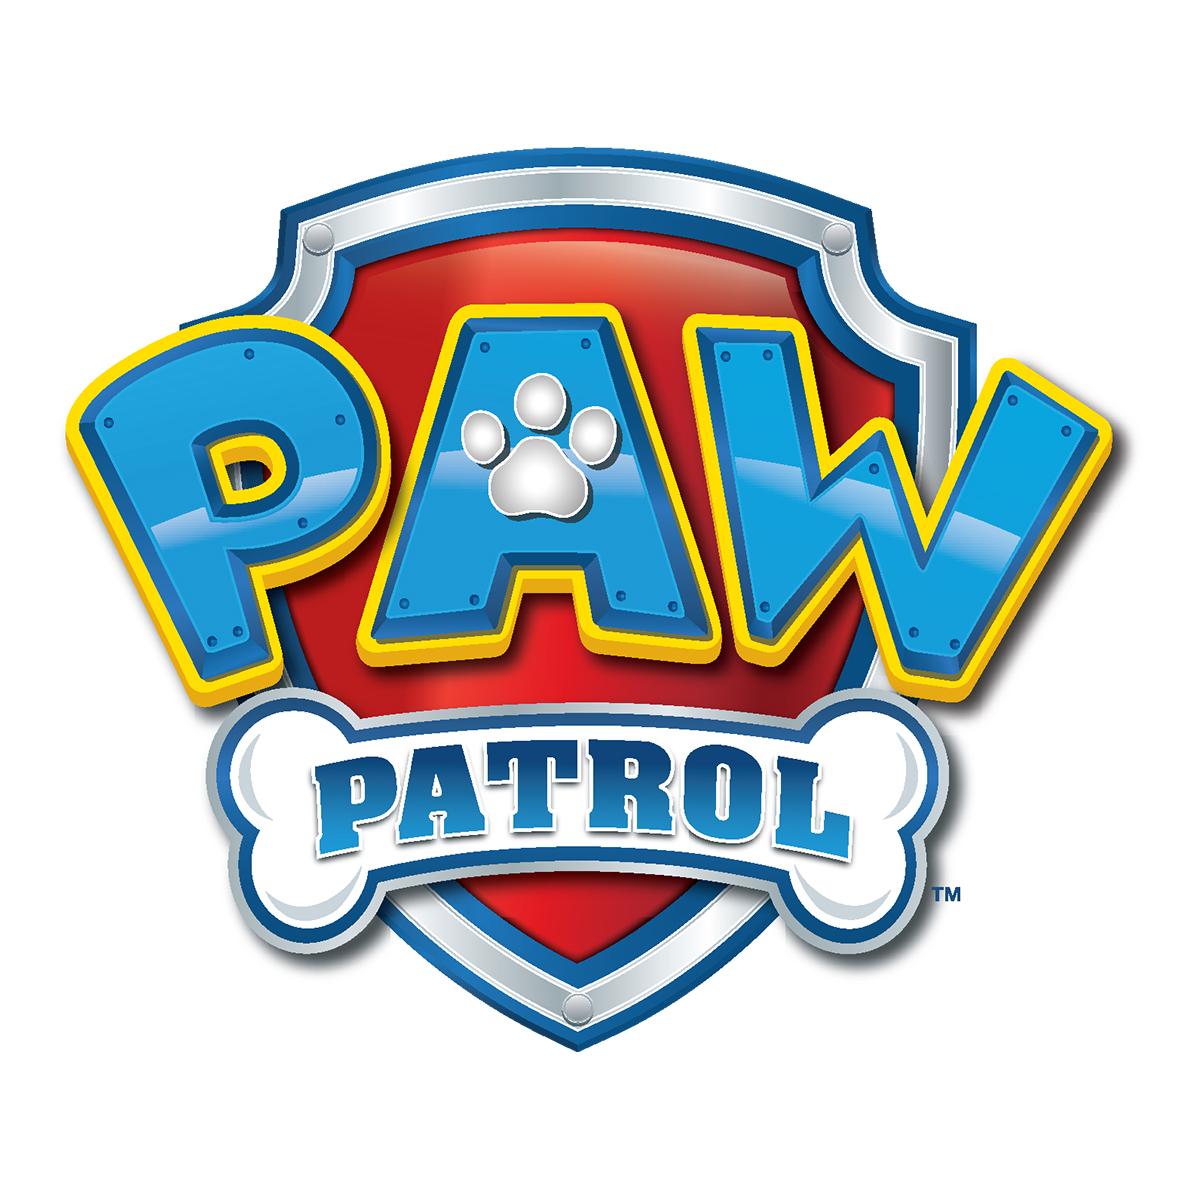 PAW Patrol Kids Throw with 3D Embellishments, 40 x 50, Doggy Dog World